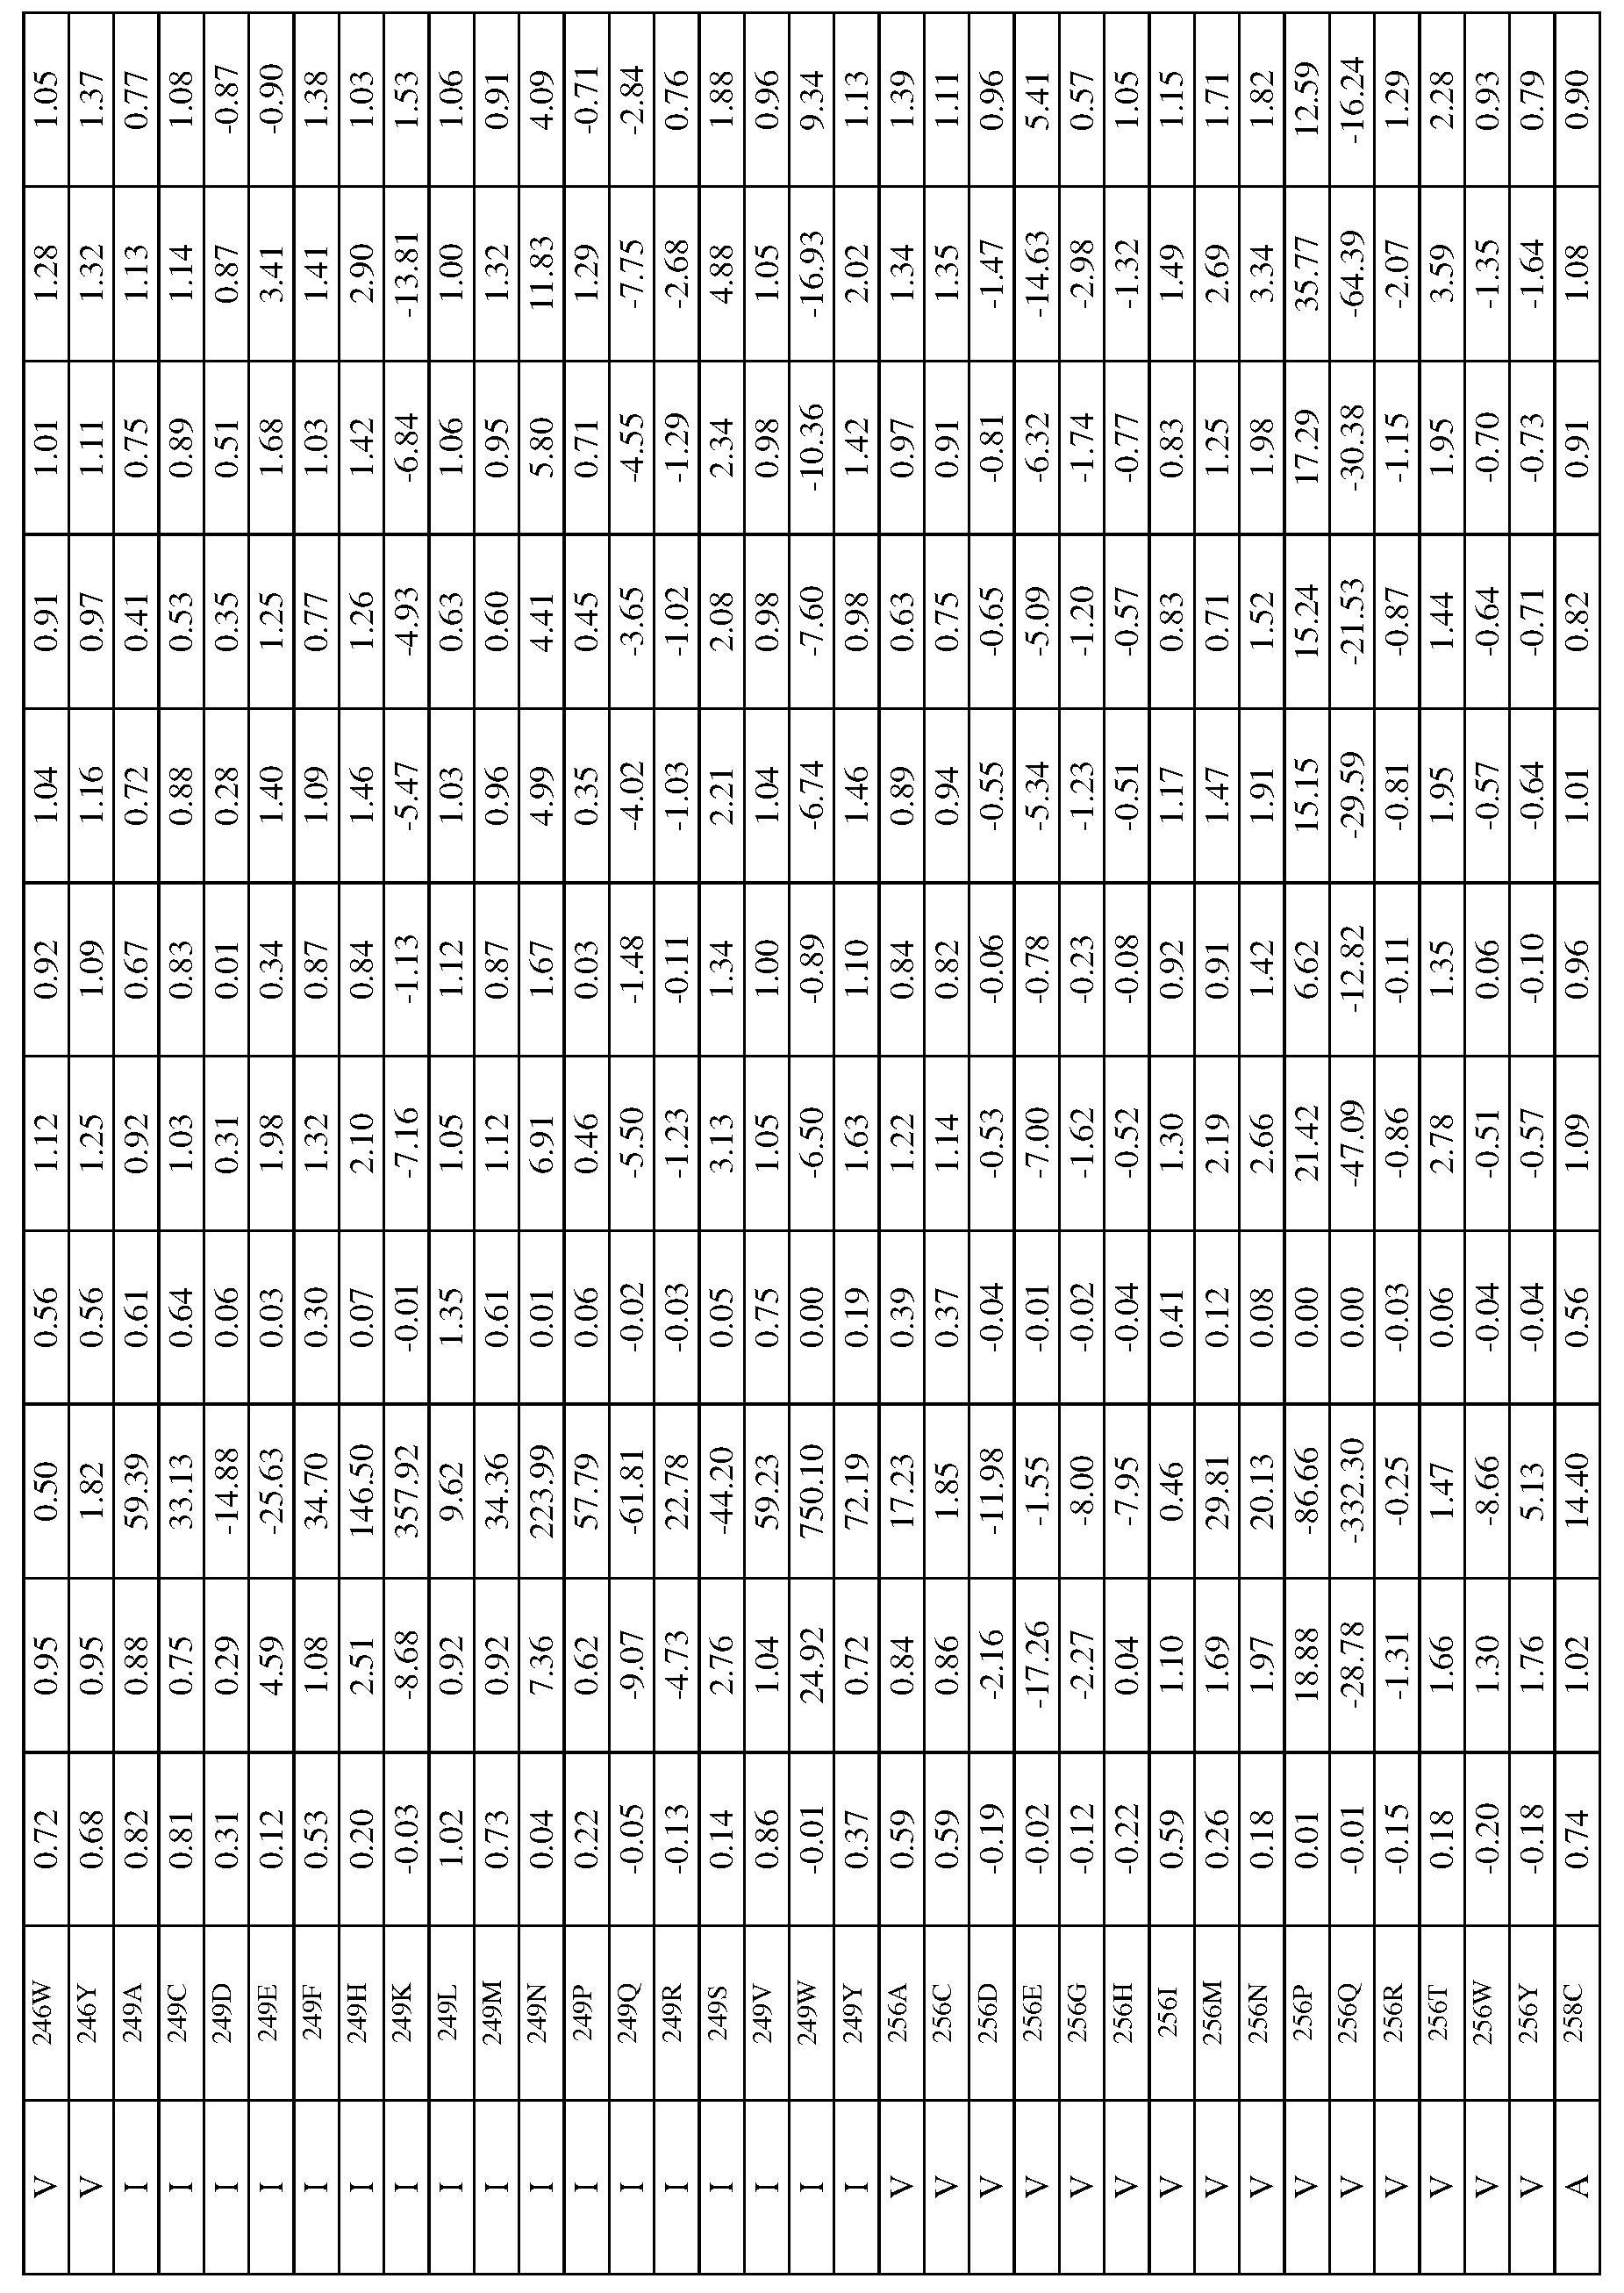 Terminatore Blank 0,34 0,5 0,75 1,0 1,5 2,5 4 6 10 16 25 35 50 terminatore